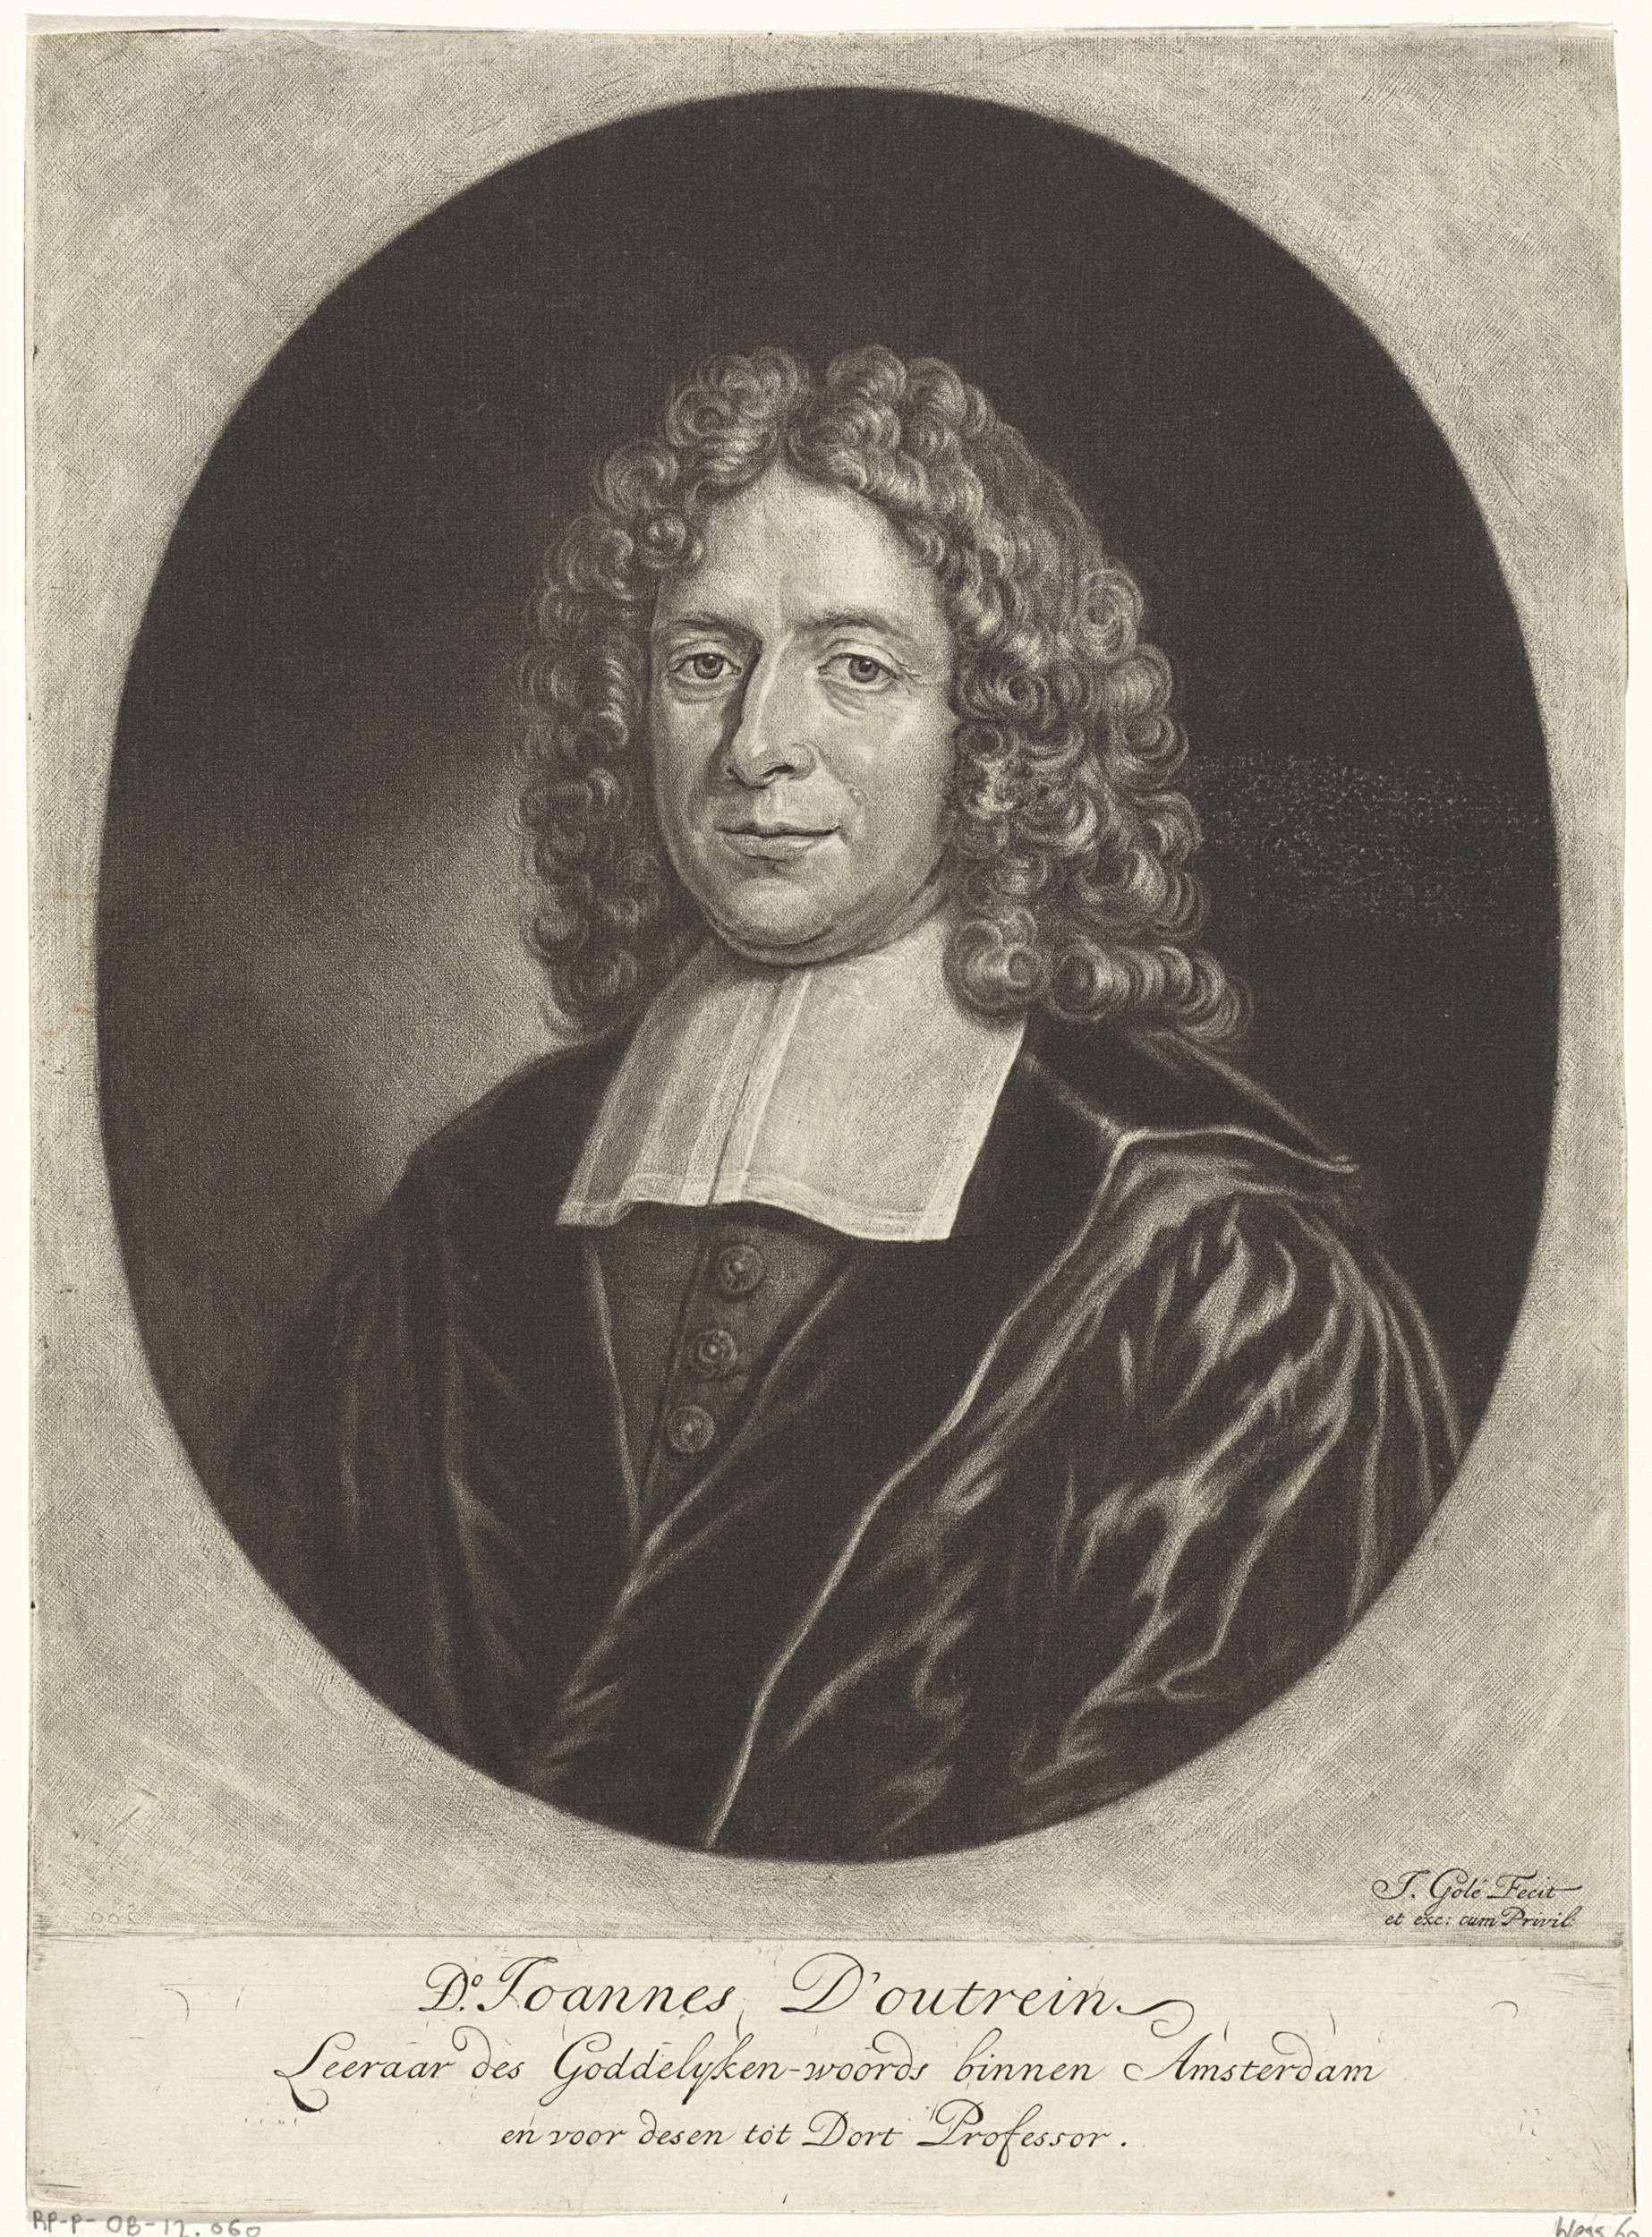 Jacob Gole | Portret van Johannes d'Outrein, Jacob Gole, 1708 - 1724 | Johannes d'Outrein, professor theologie te Dordrecht en vanaf 1708 predikant te Amsterdam.